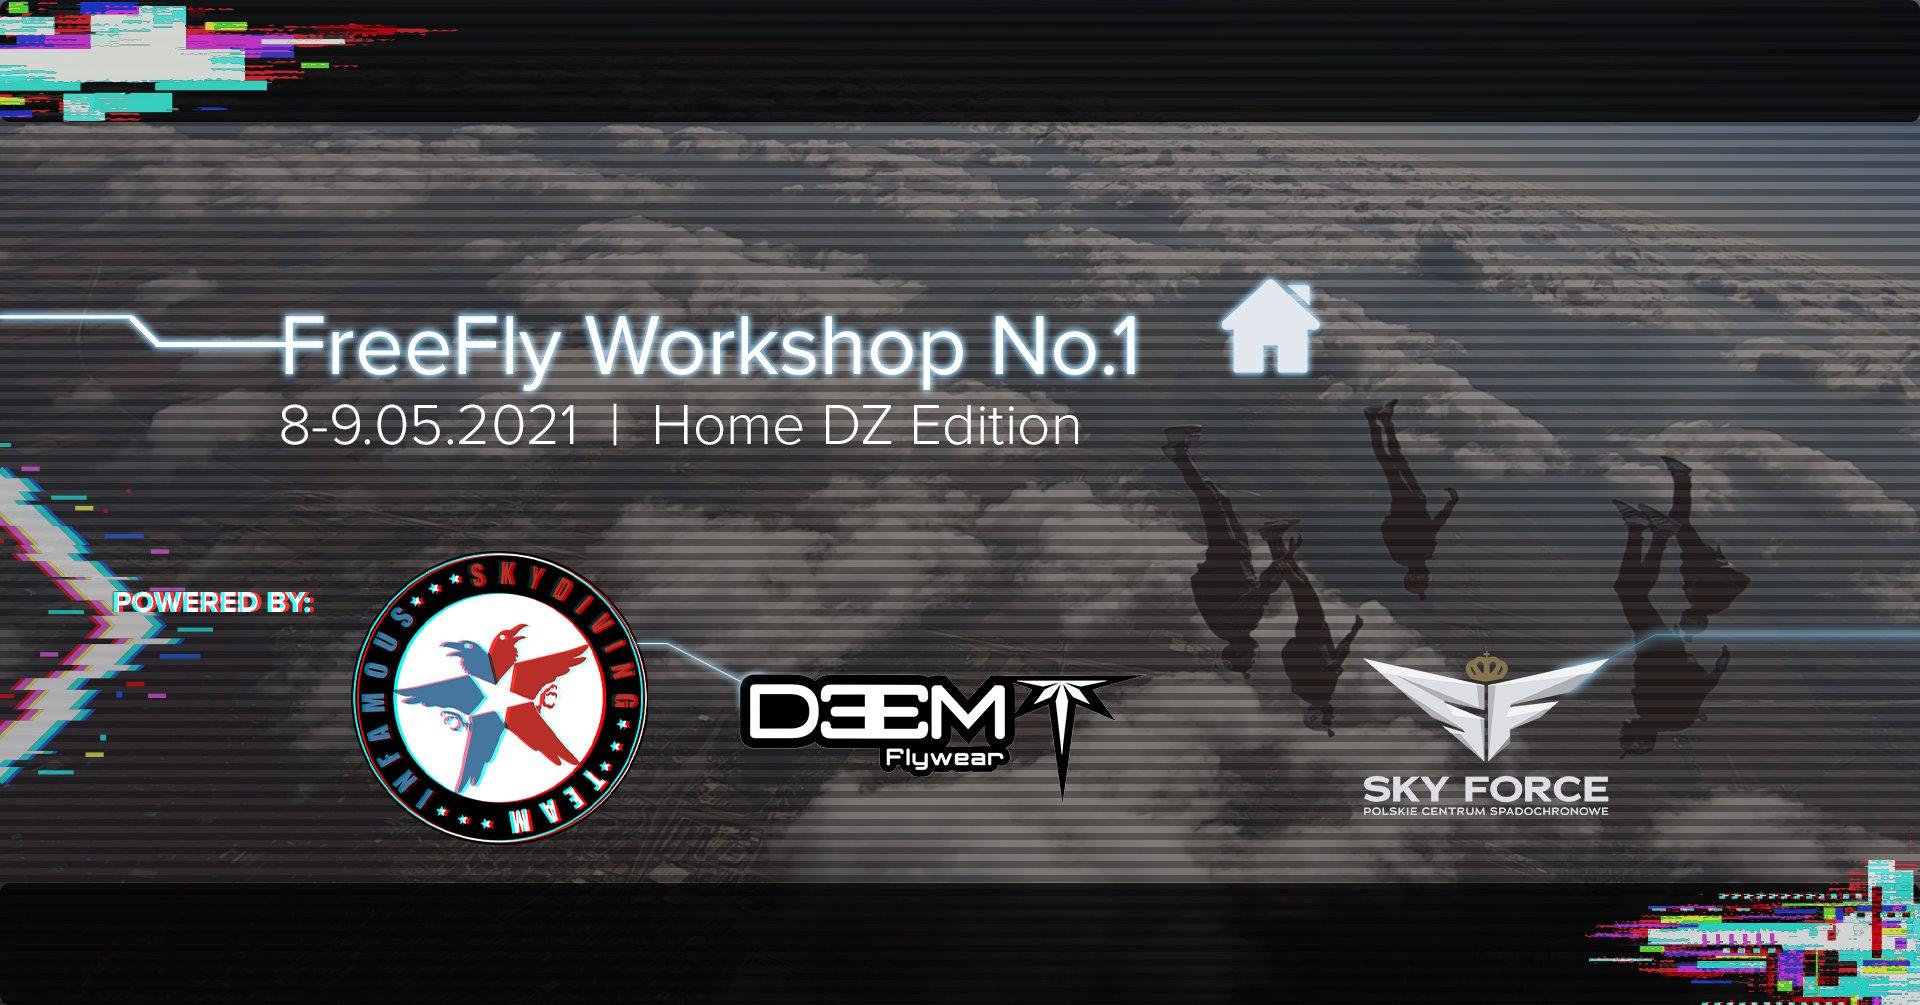 166462424 1237180250011702 2427854363283154022 n - Freefly Workshop No.1 8-09.05.2021